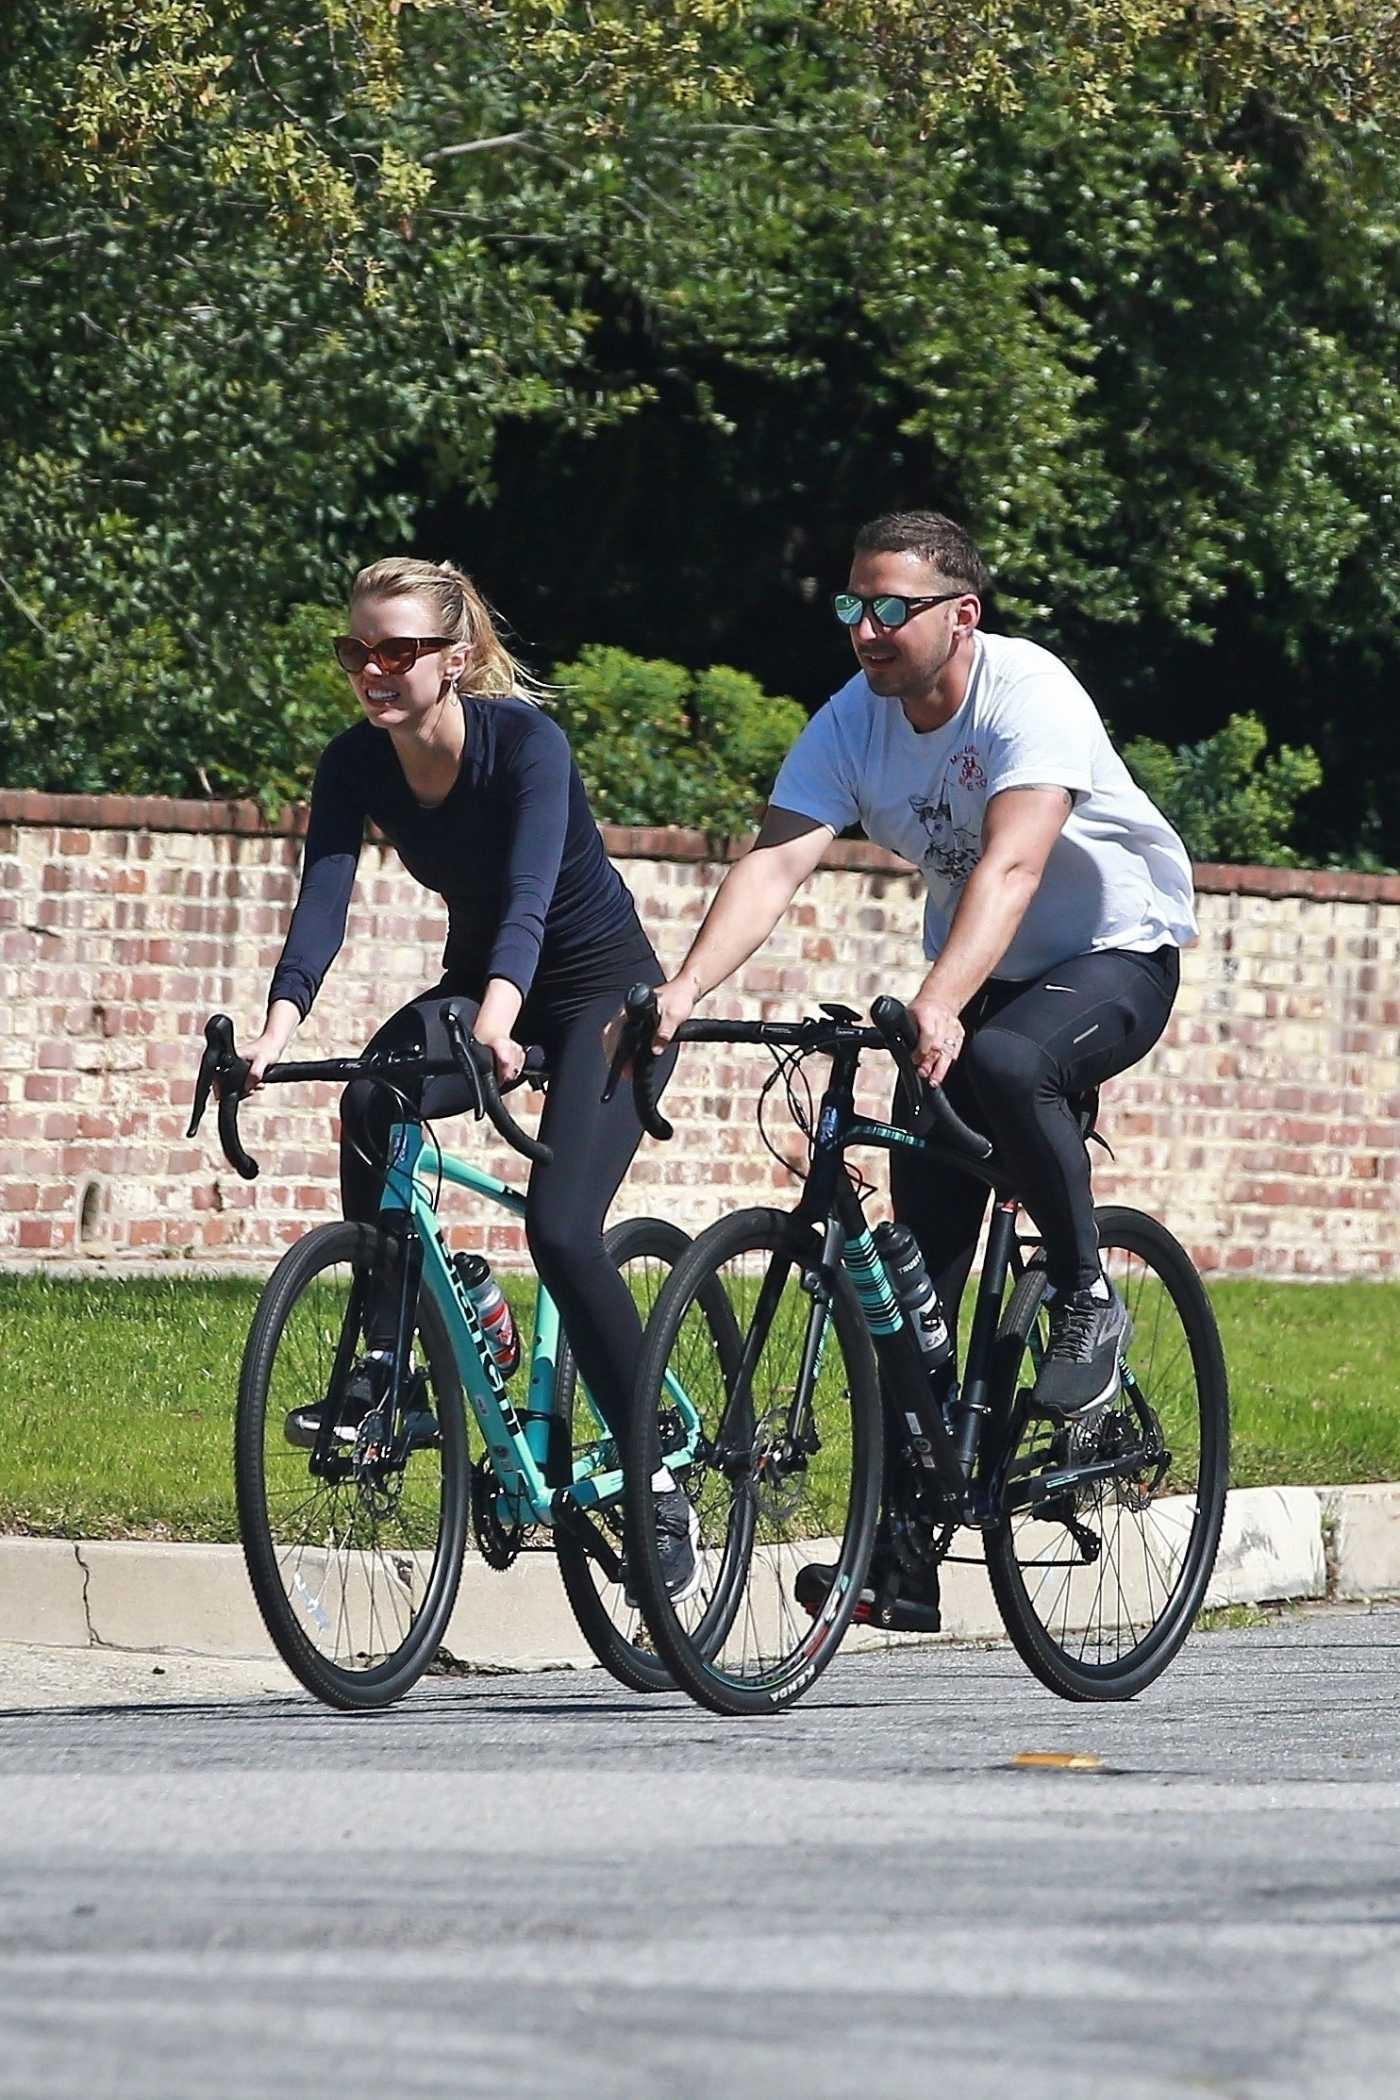 Shia LaBeouf Enjoys a Bike Ride Out wit Mia Goth in Pasadena 04/01/2020